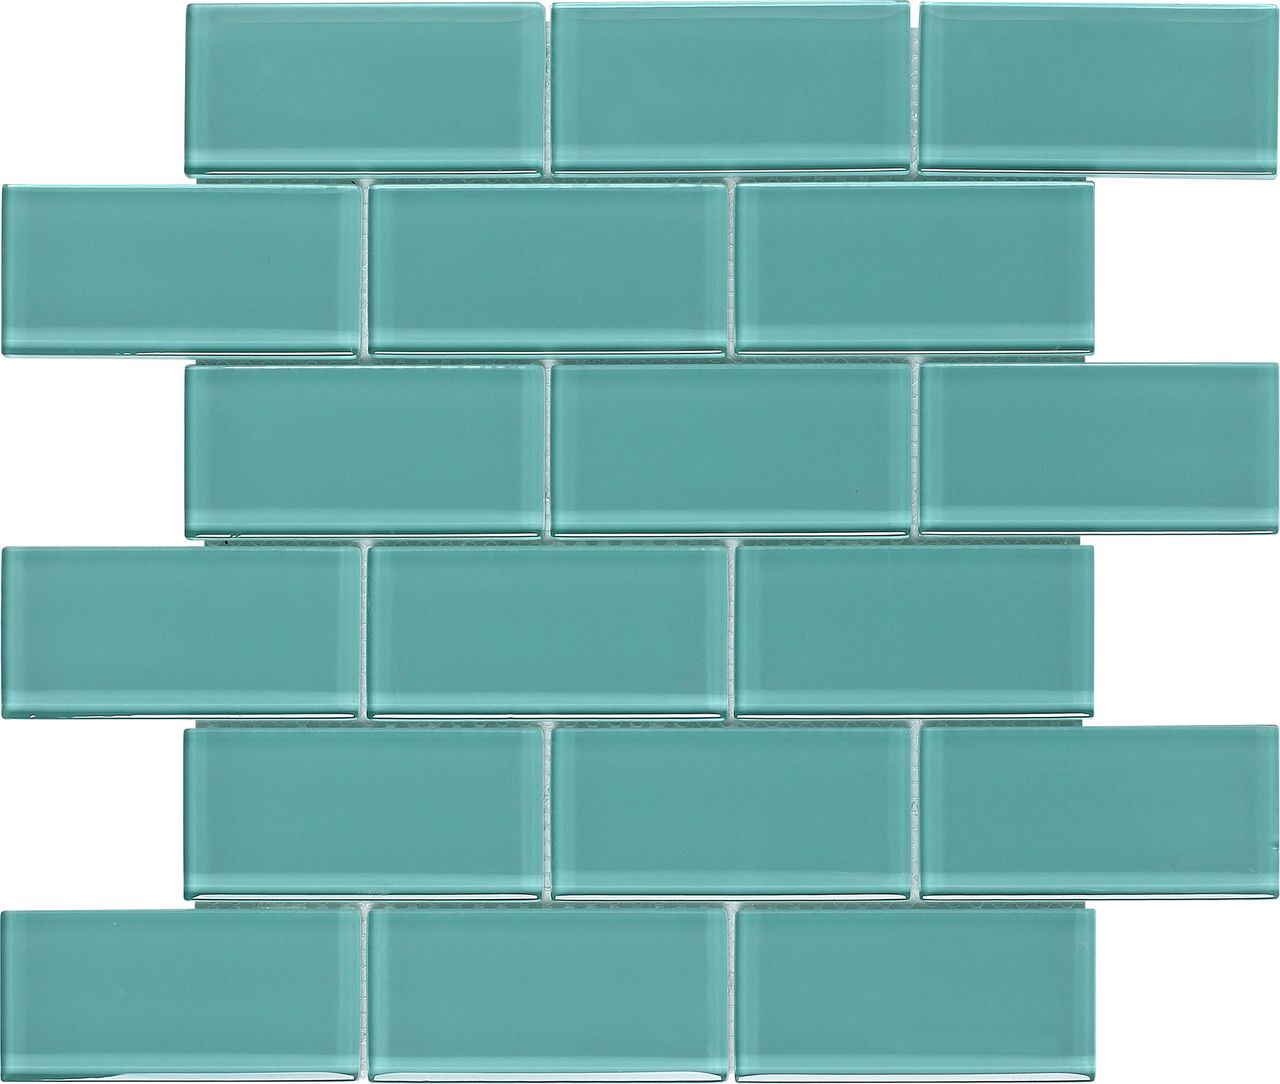 Subway Glass Tile Turquoise 2x4 | Pinterest | Turquoise, Kitchen ...